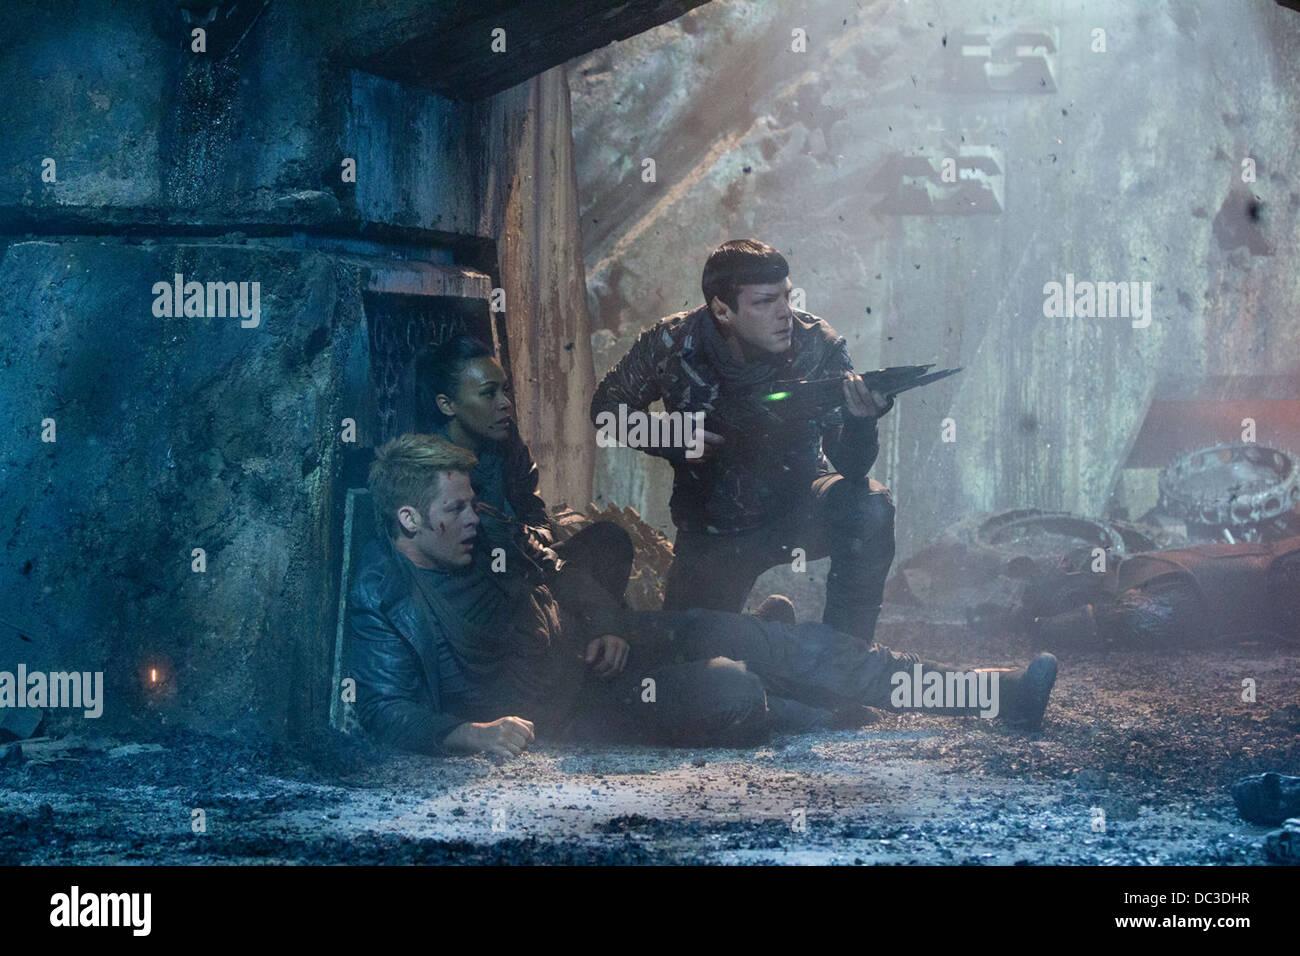 STAR TREK INTO DARKNESS (2013) CHRIS PINE, ZOE SALDANA, ZACHARY QUINTO J J ABRAMS (DIR) 022 MOVIESTORE COLLECTION - Stock Image